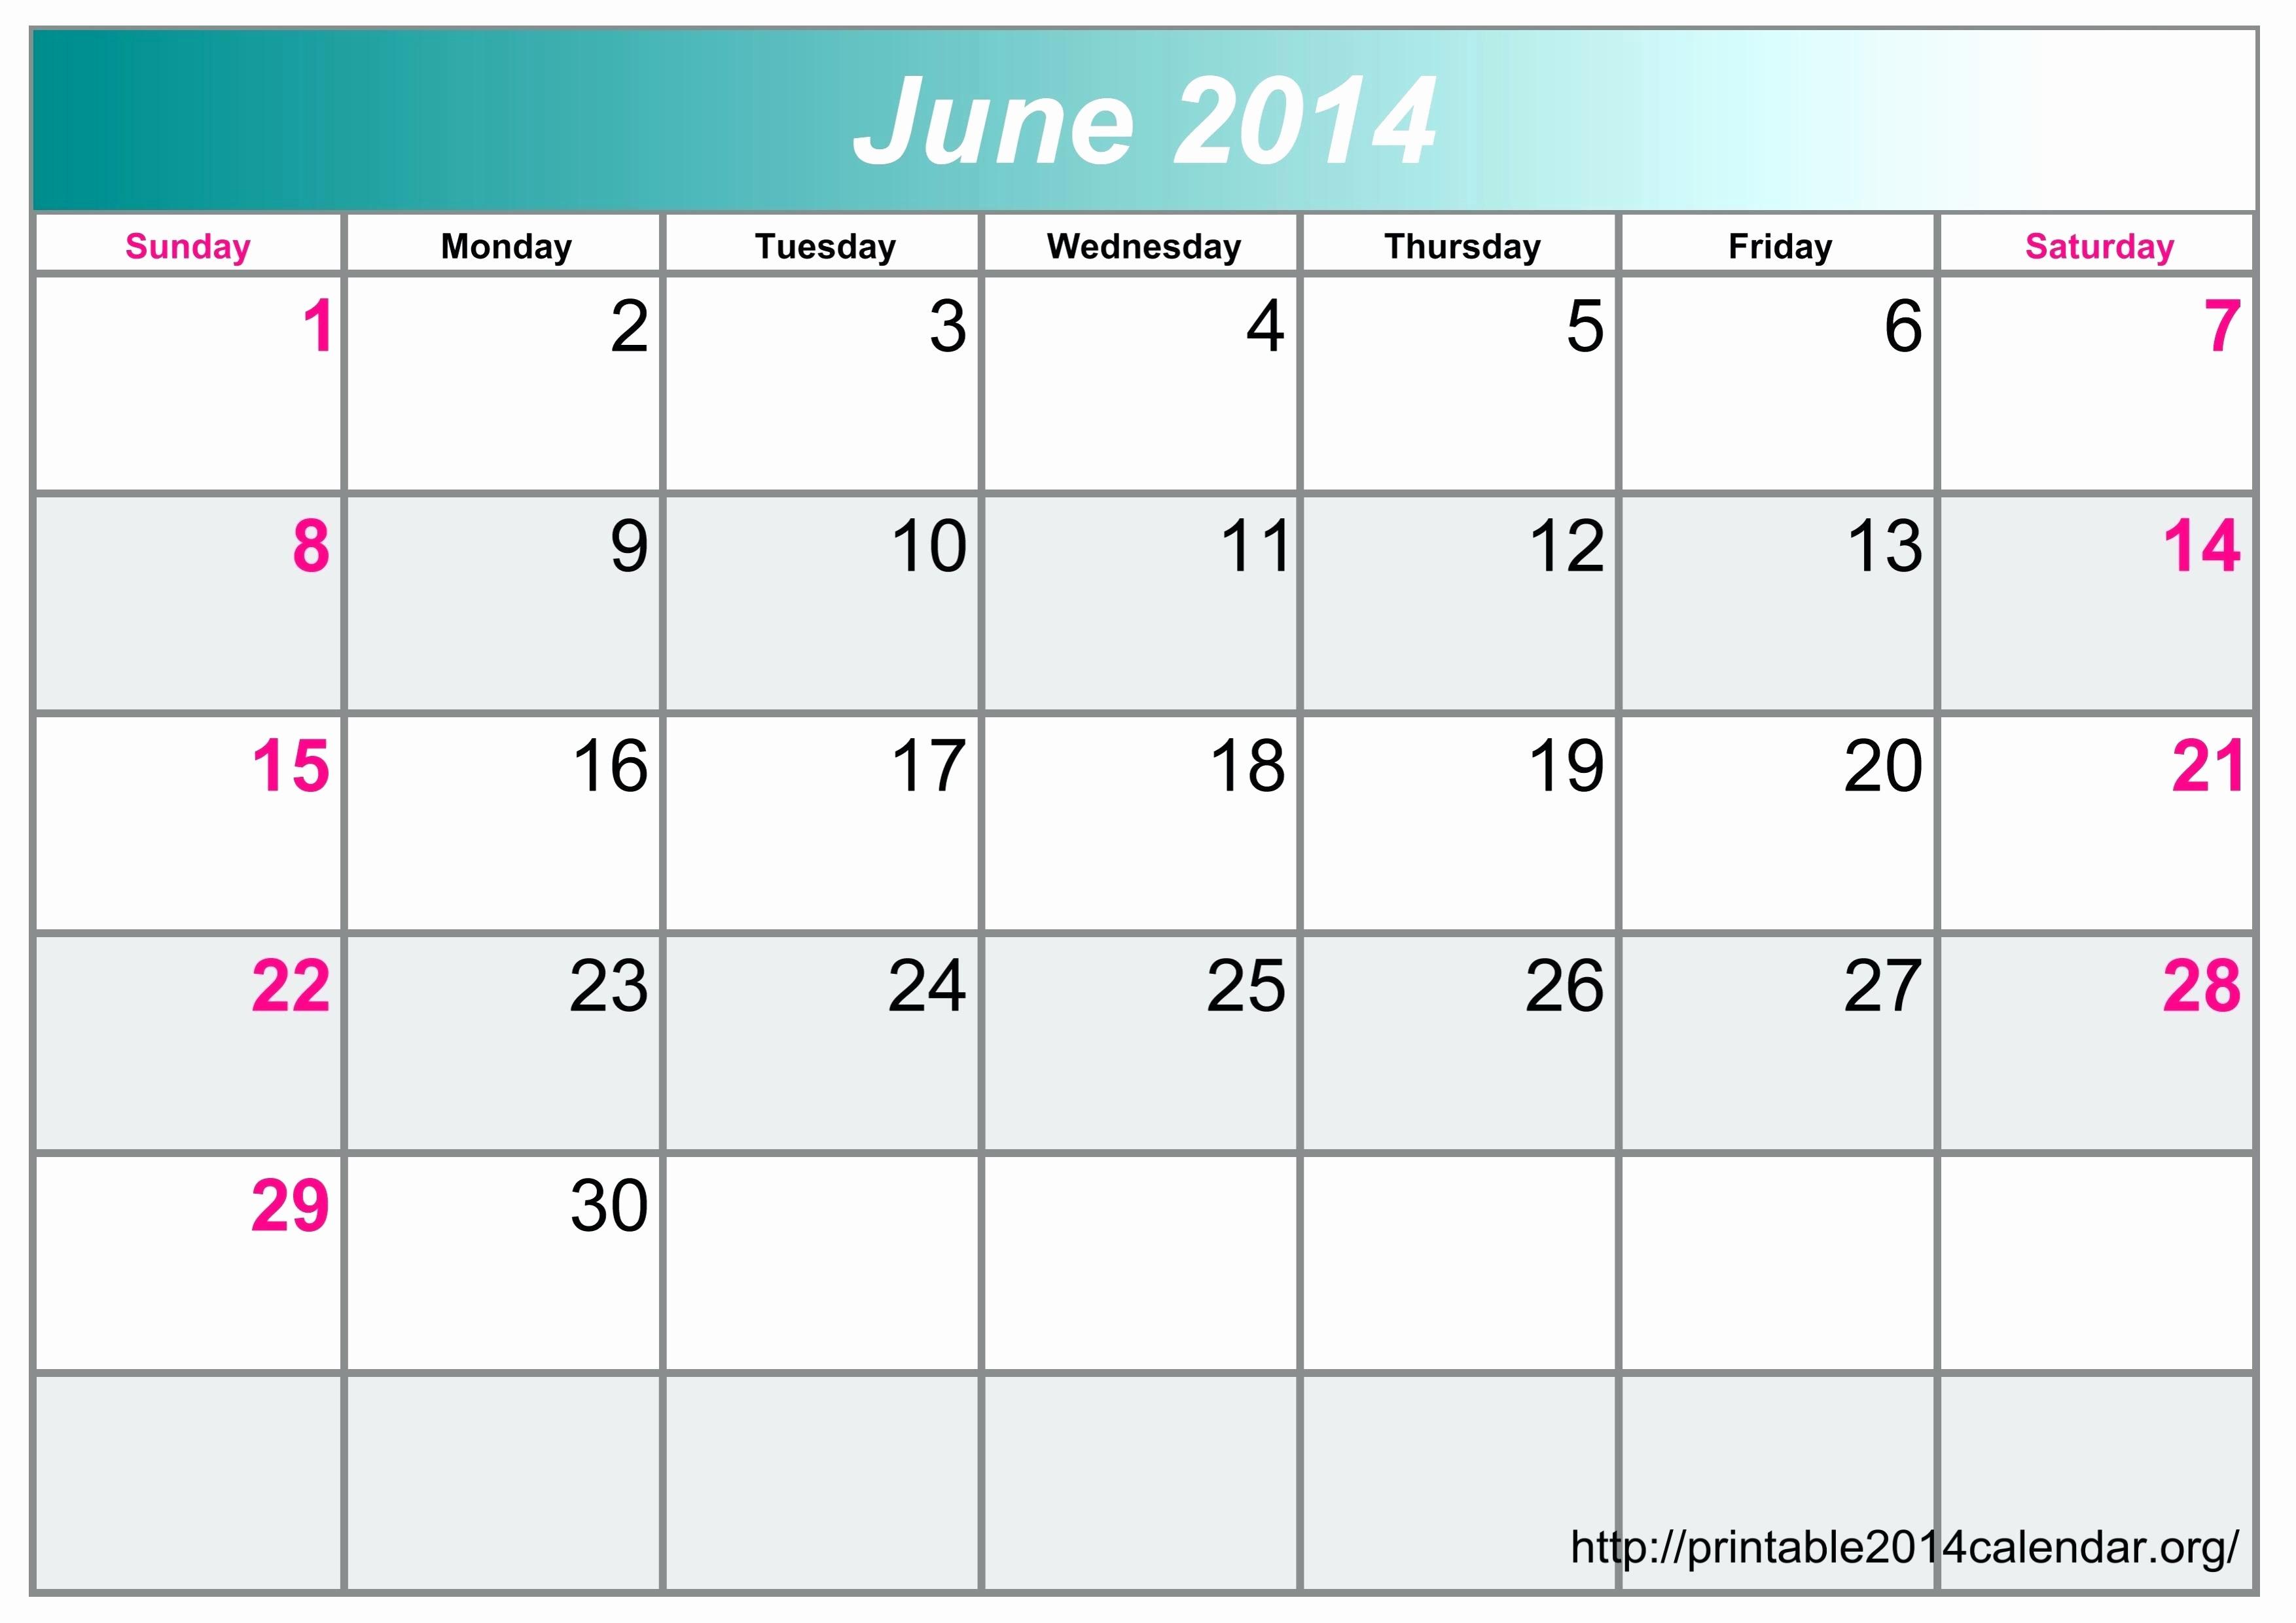 2015 Yearly Calendar Printable Landscape Elegant Template June Calendar Template Printable 2015 Landscape